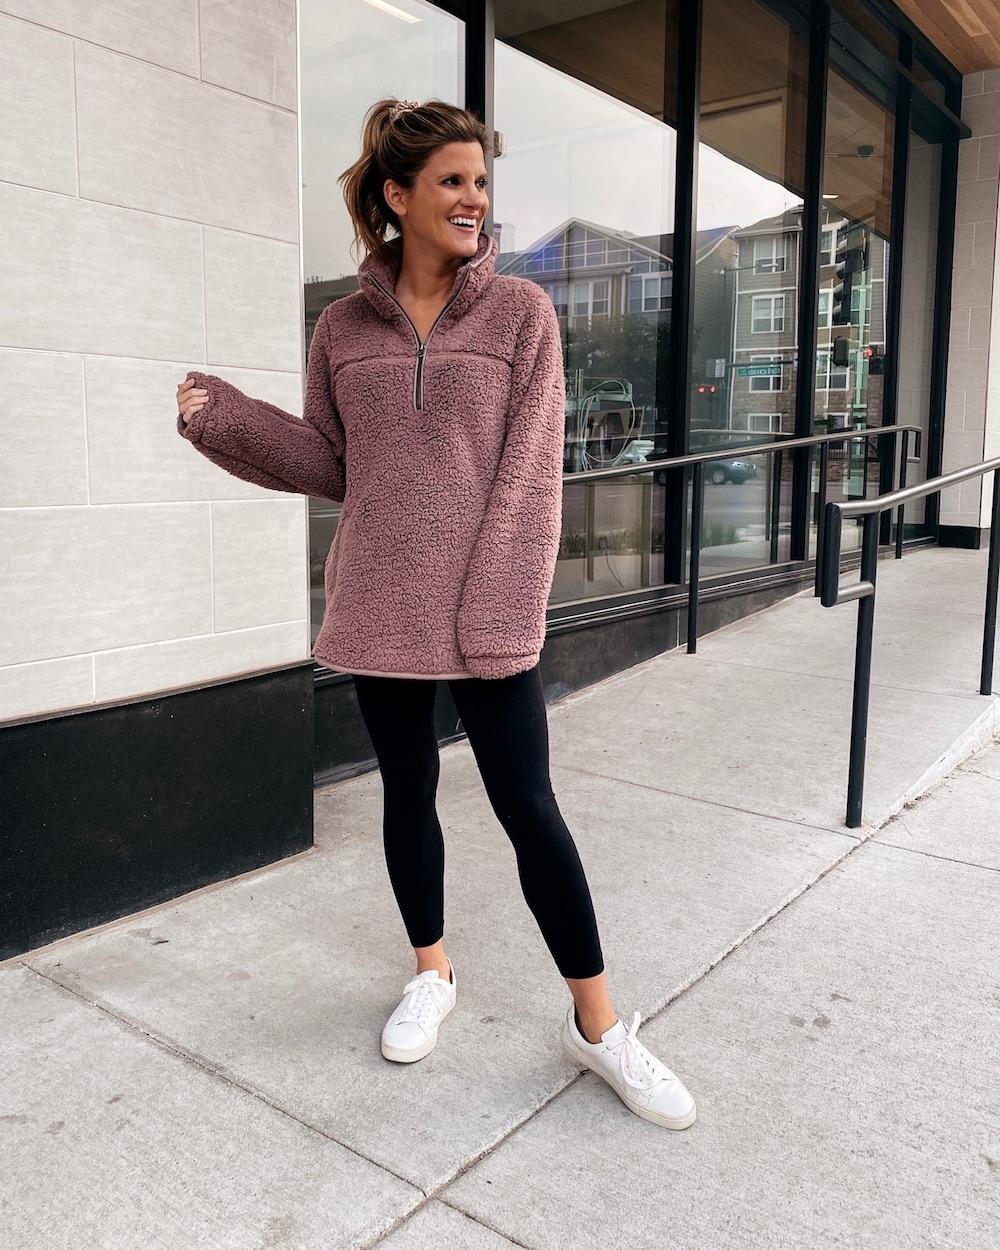 abercrombie fleece, black leggings, white sneakers, cozy fall outfit